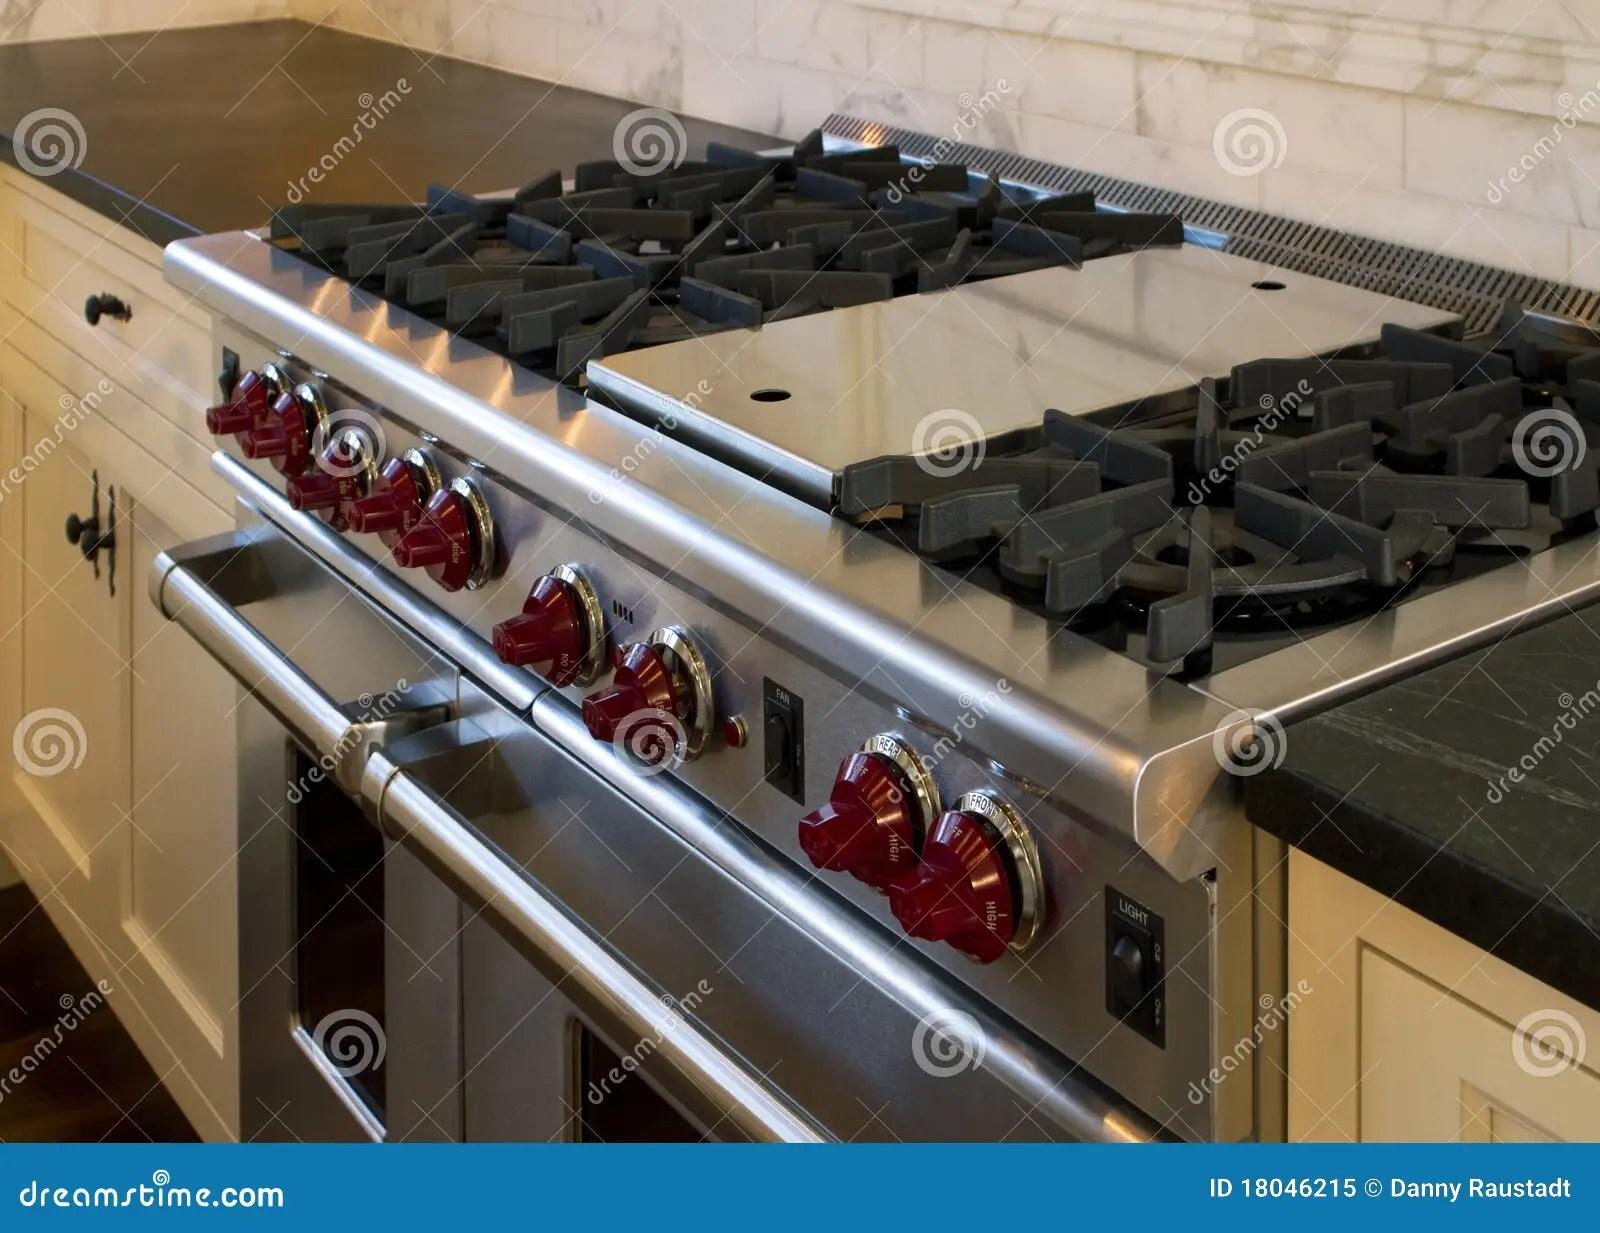 Cottage Style Kitchen Gas Cooking Range Stock Image